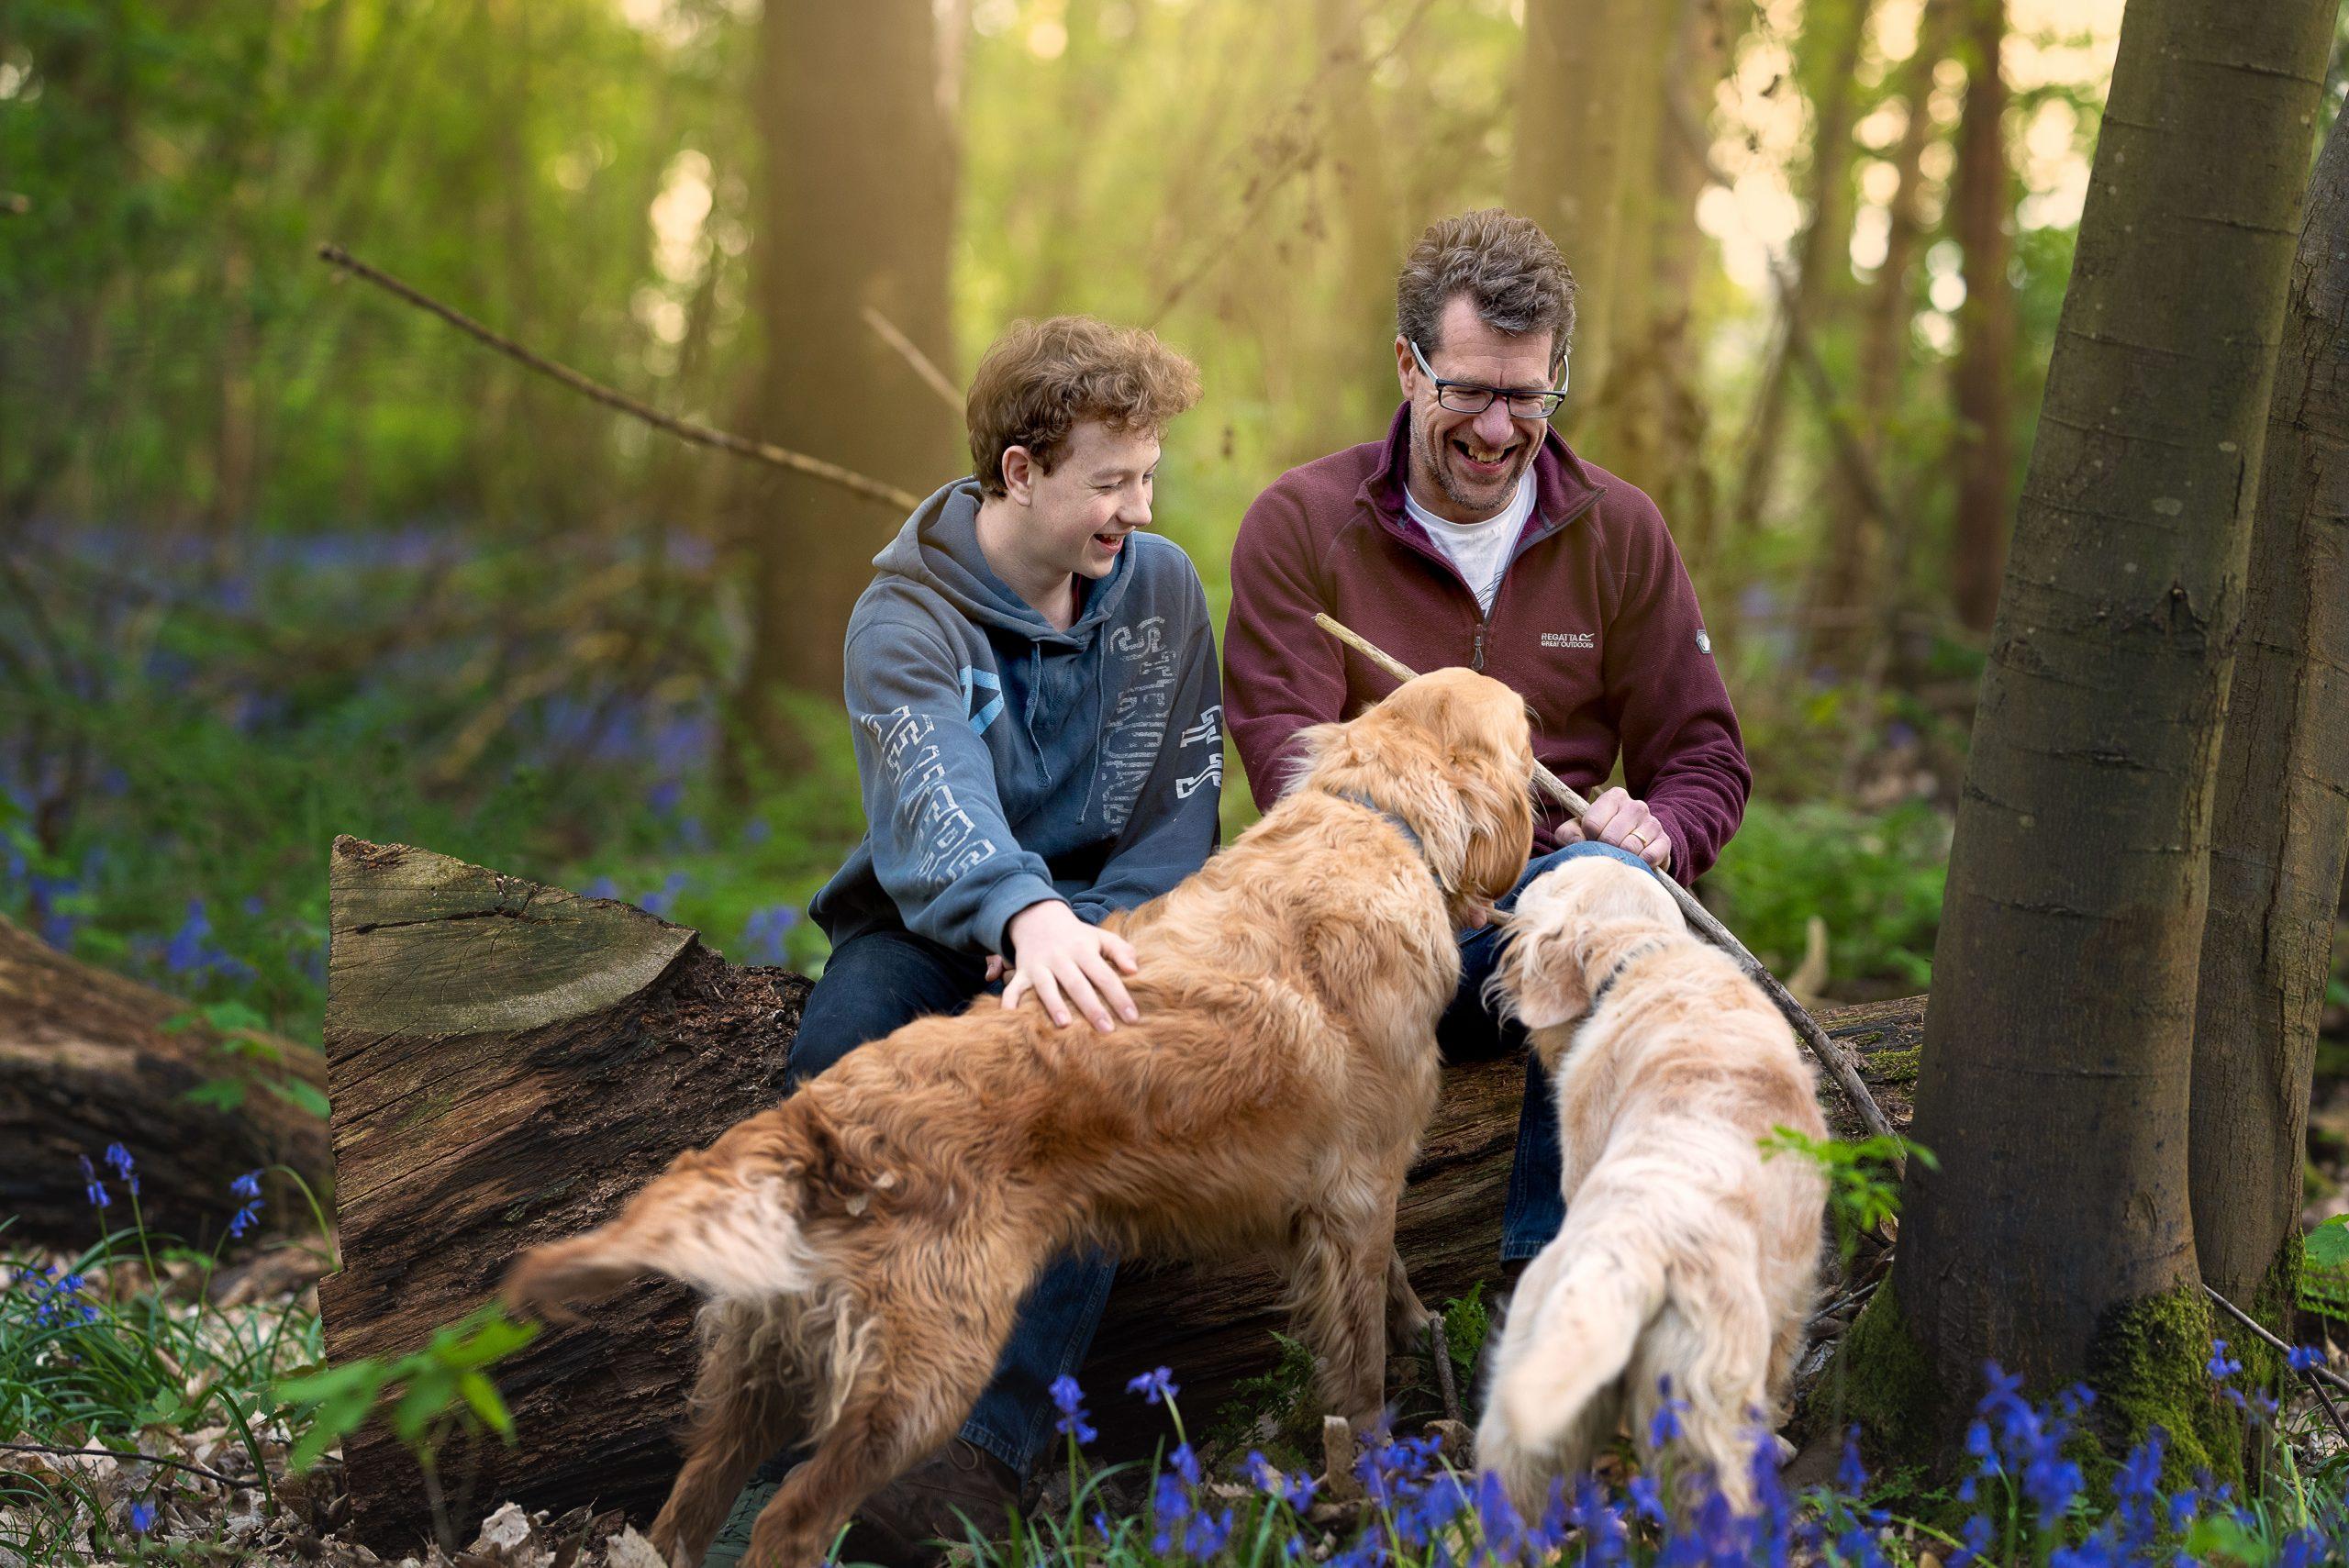 dougal photography, newborn photography, maternity photography, bluebell woods photography, family photography